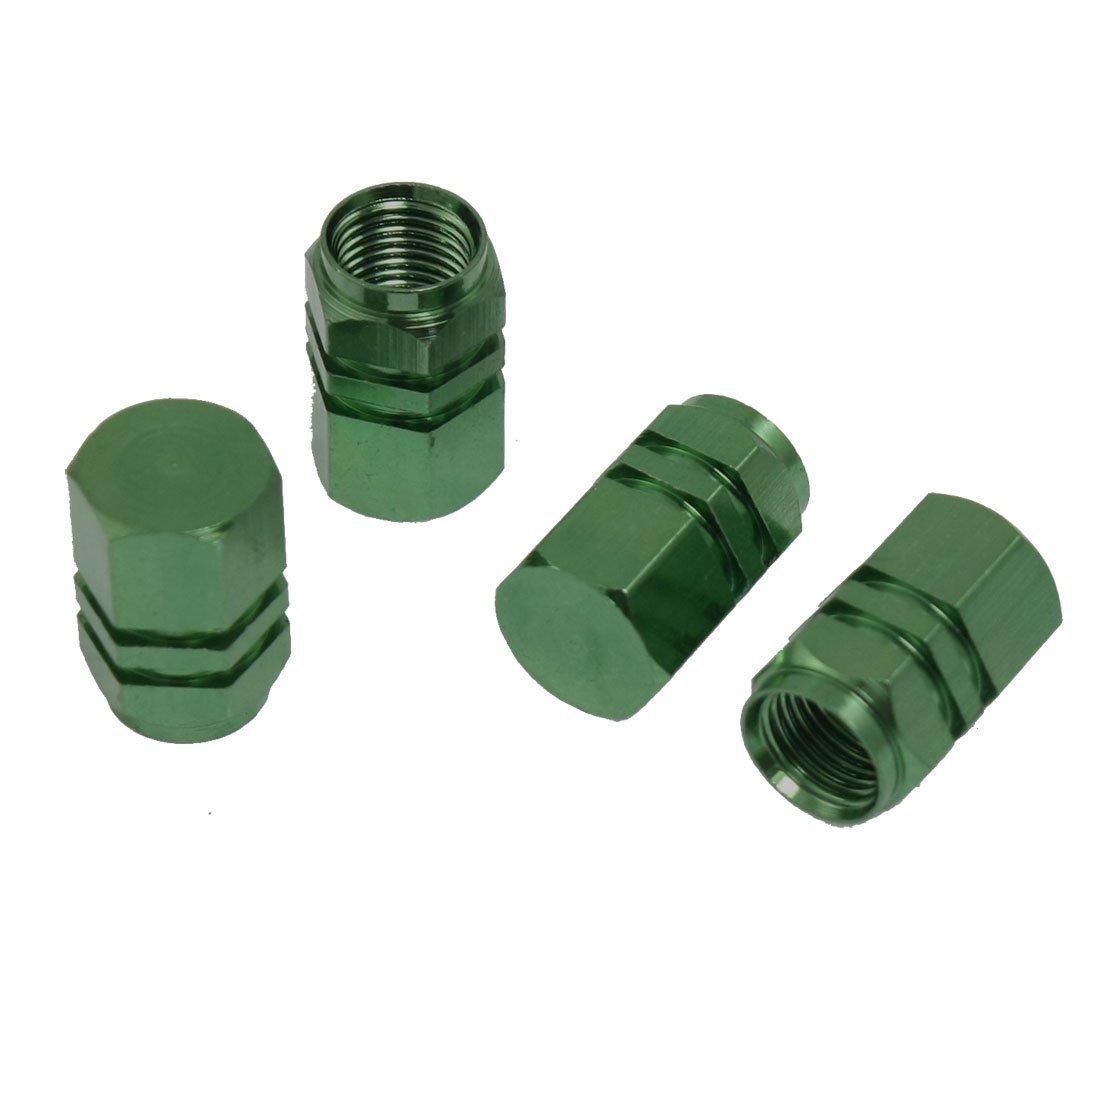 SODIAL(R) Car Auto Hexagon Tyre Tire Valve Stems Caps Cover Green 4 Pcs